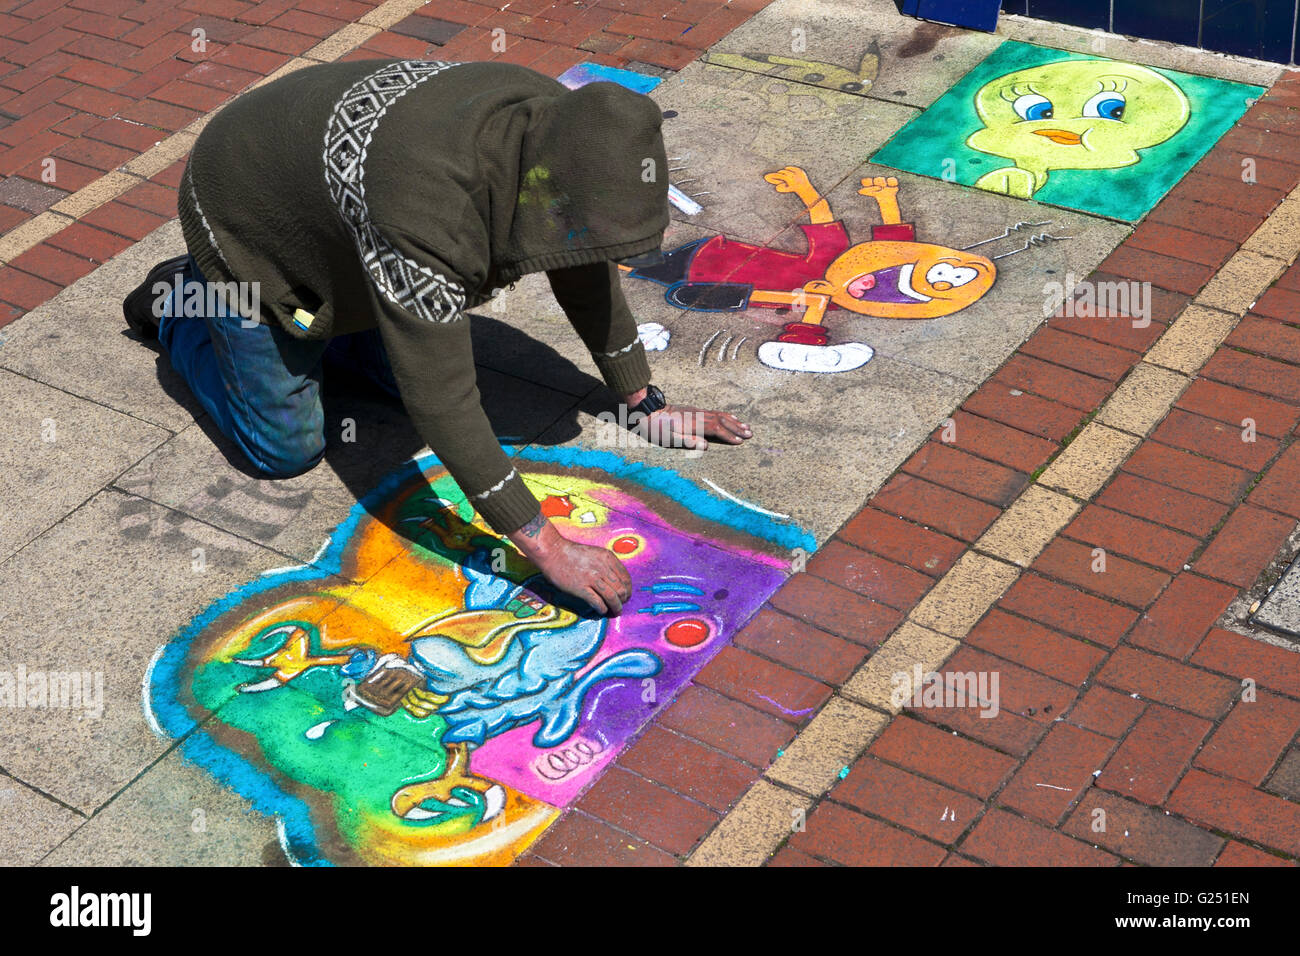 A man knelt down chalk drawing on art, artwork on pavement, Fleetwood, Thornton-Cleveleys, Flyde Coast, Lancashire, - Stock Image